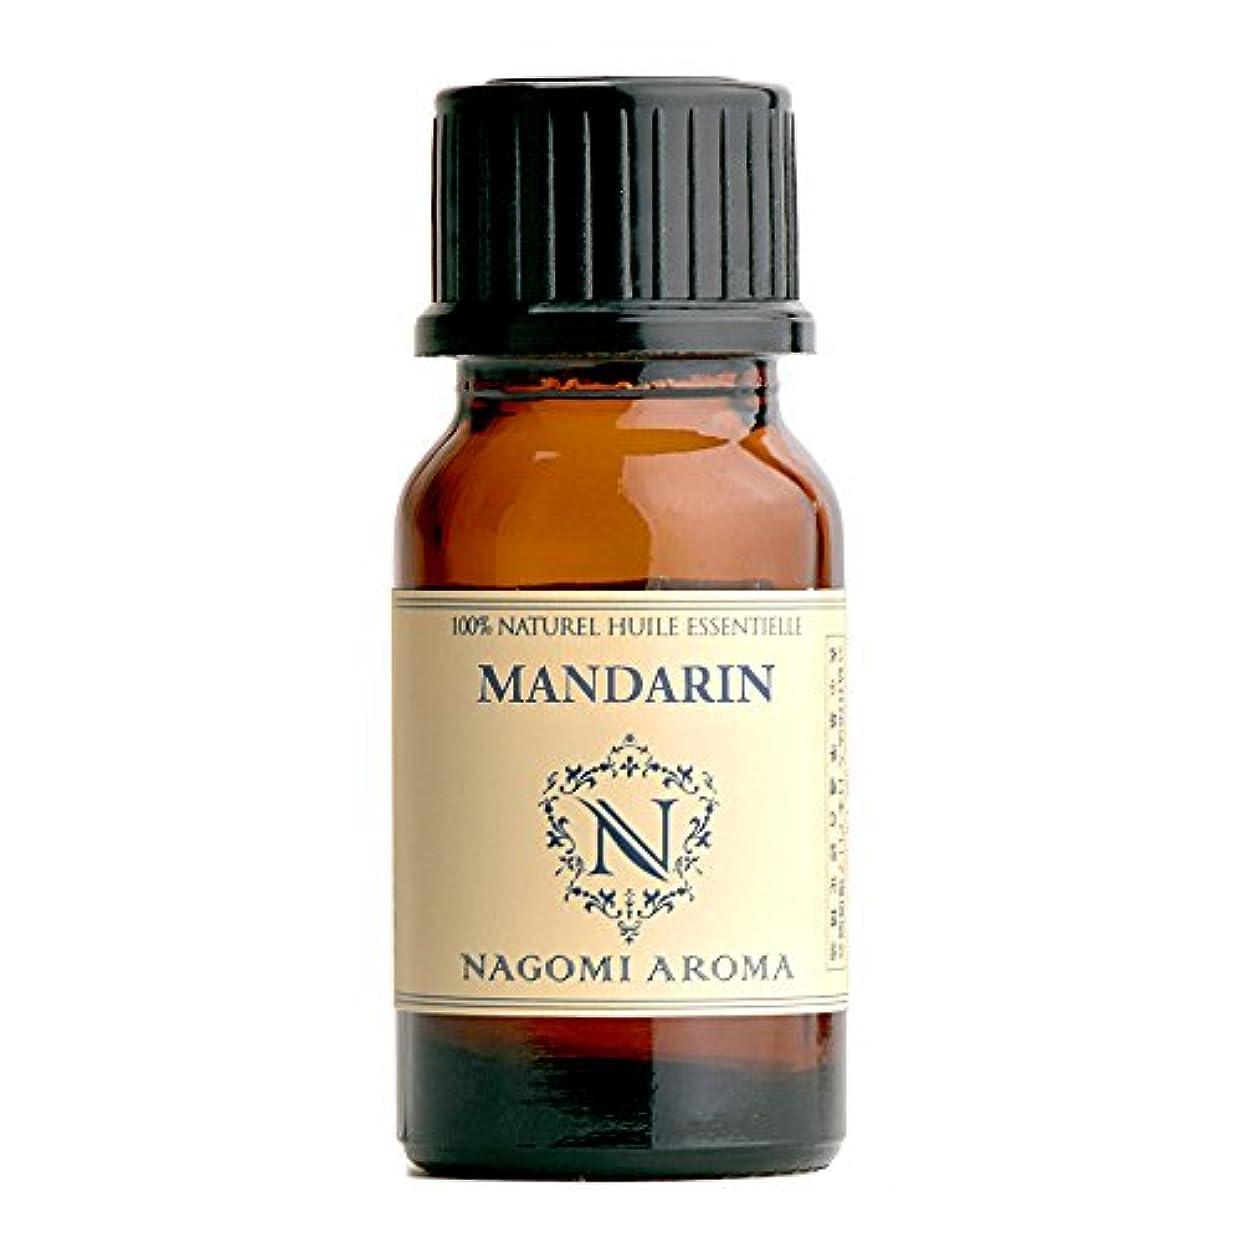 NAGOMI AROMA マンダリン 10ml 【AEAJ認定精油】【アロマオイル】